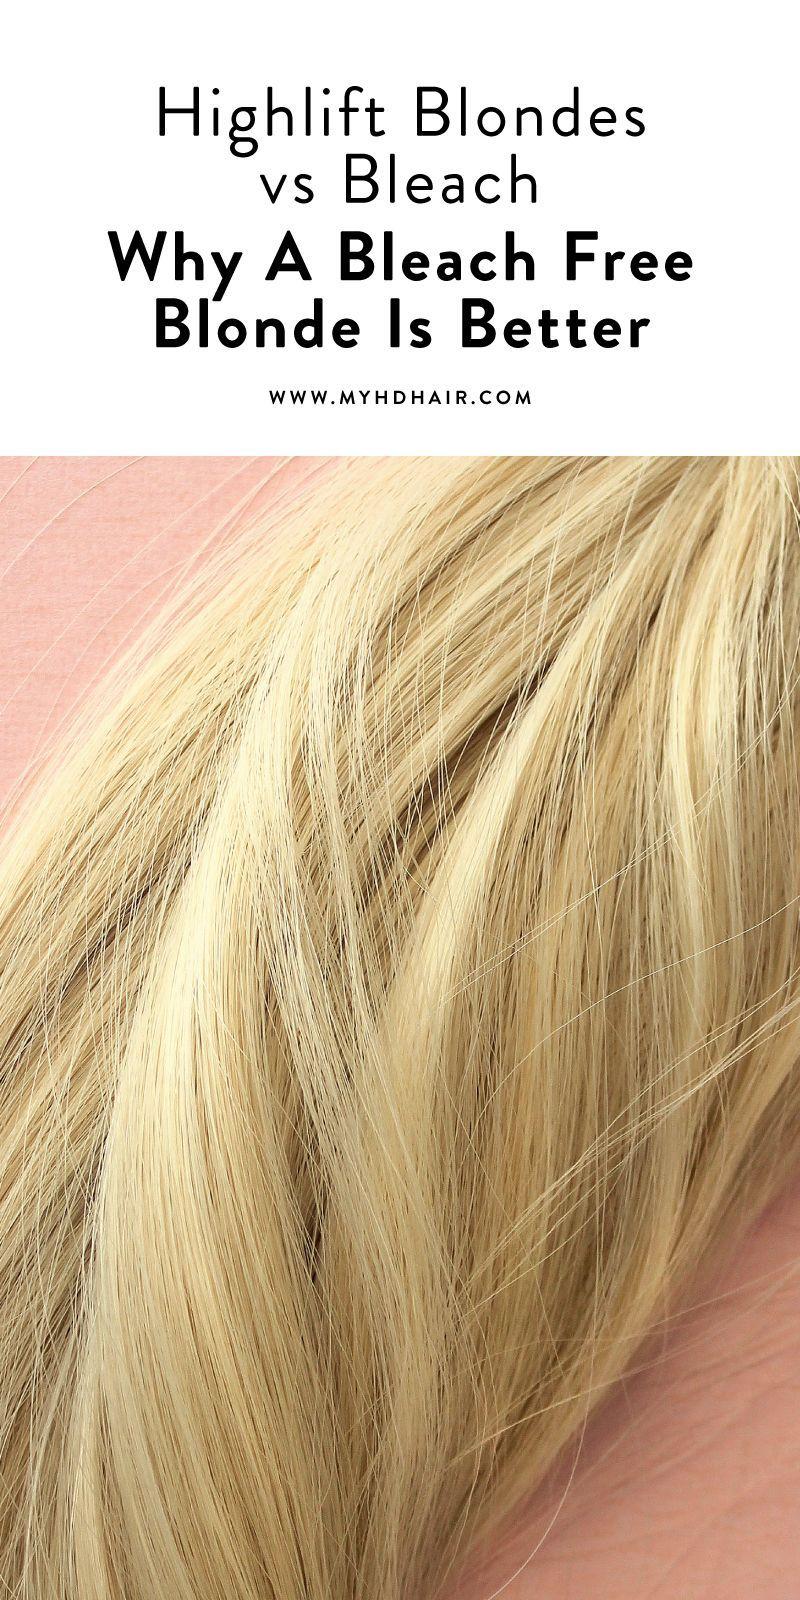 Highlift Blondes Vs Bleach Why A Bleach Free Blonde Is Better